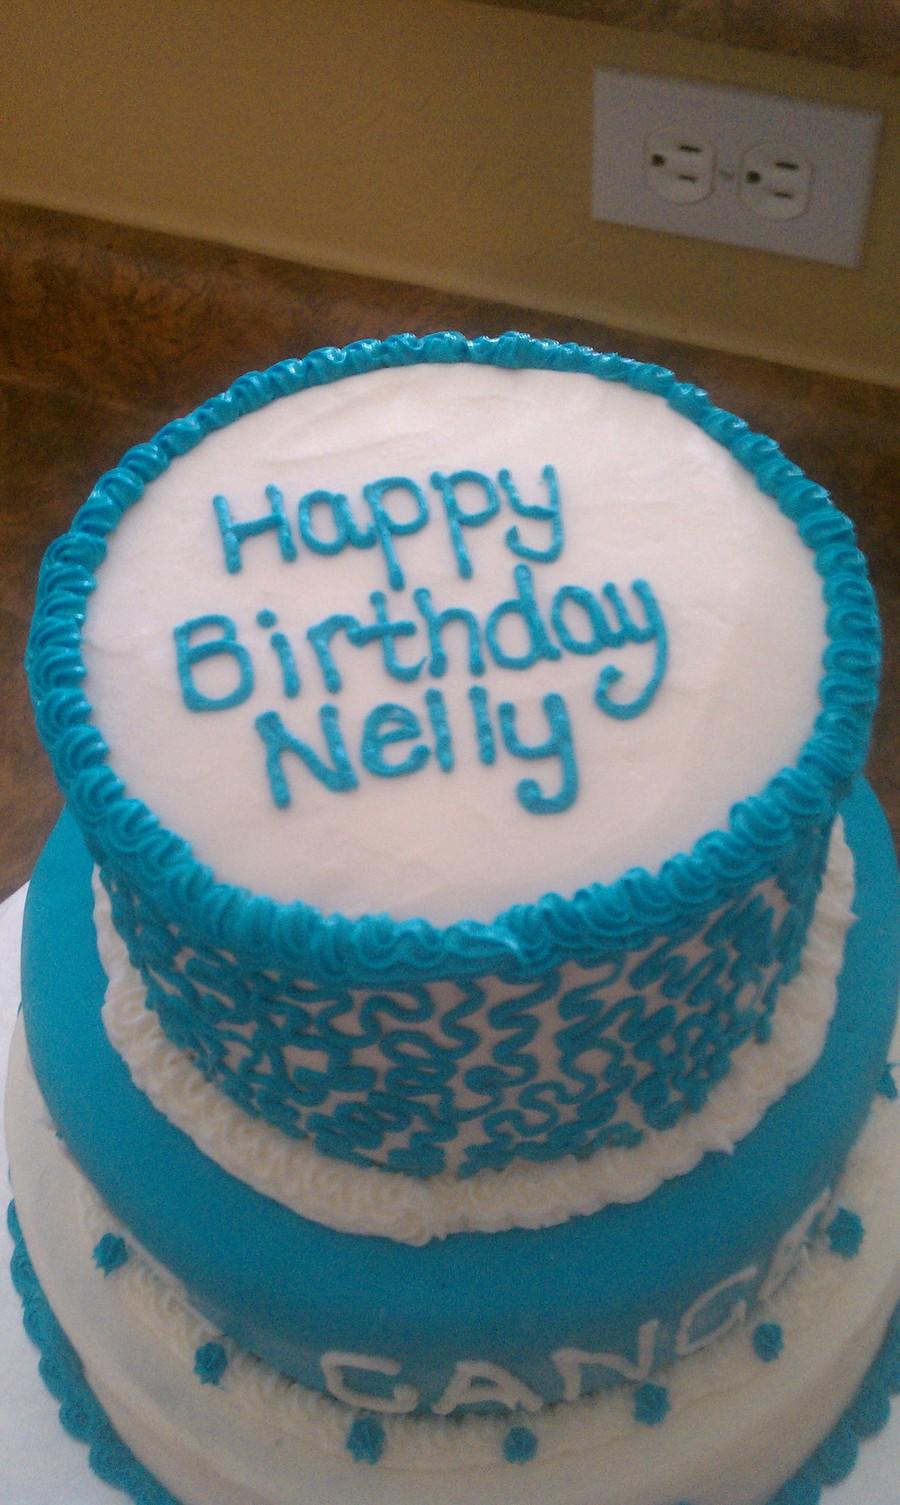 Colon Cancer Survivor Birthday CakeCentralcom - Slayer birthday cake